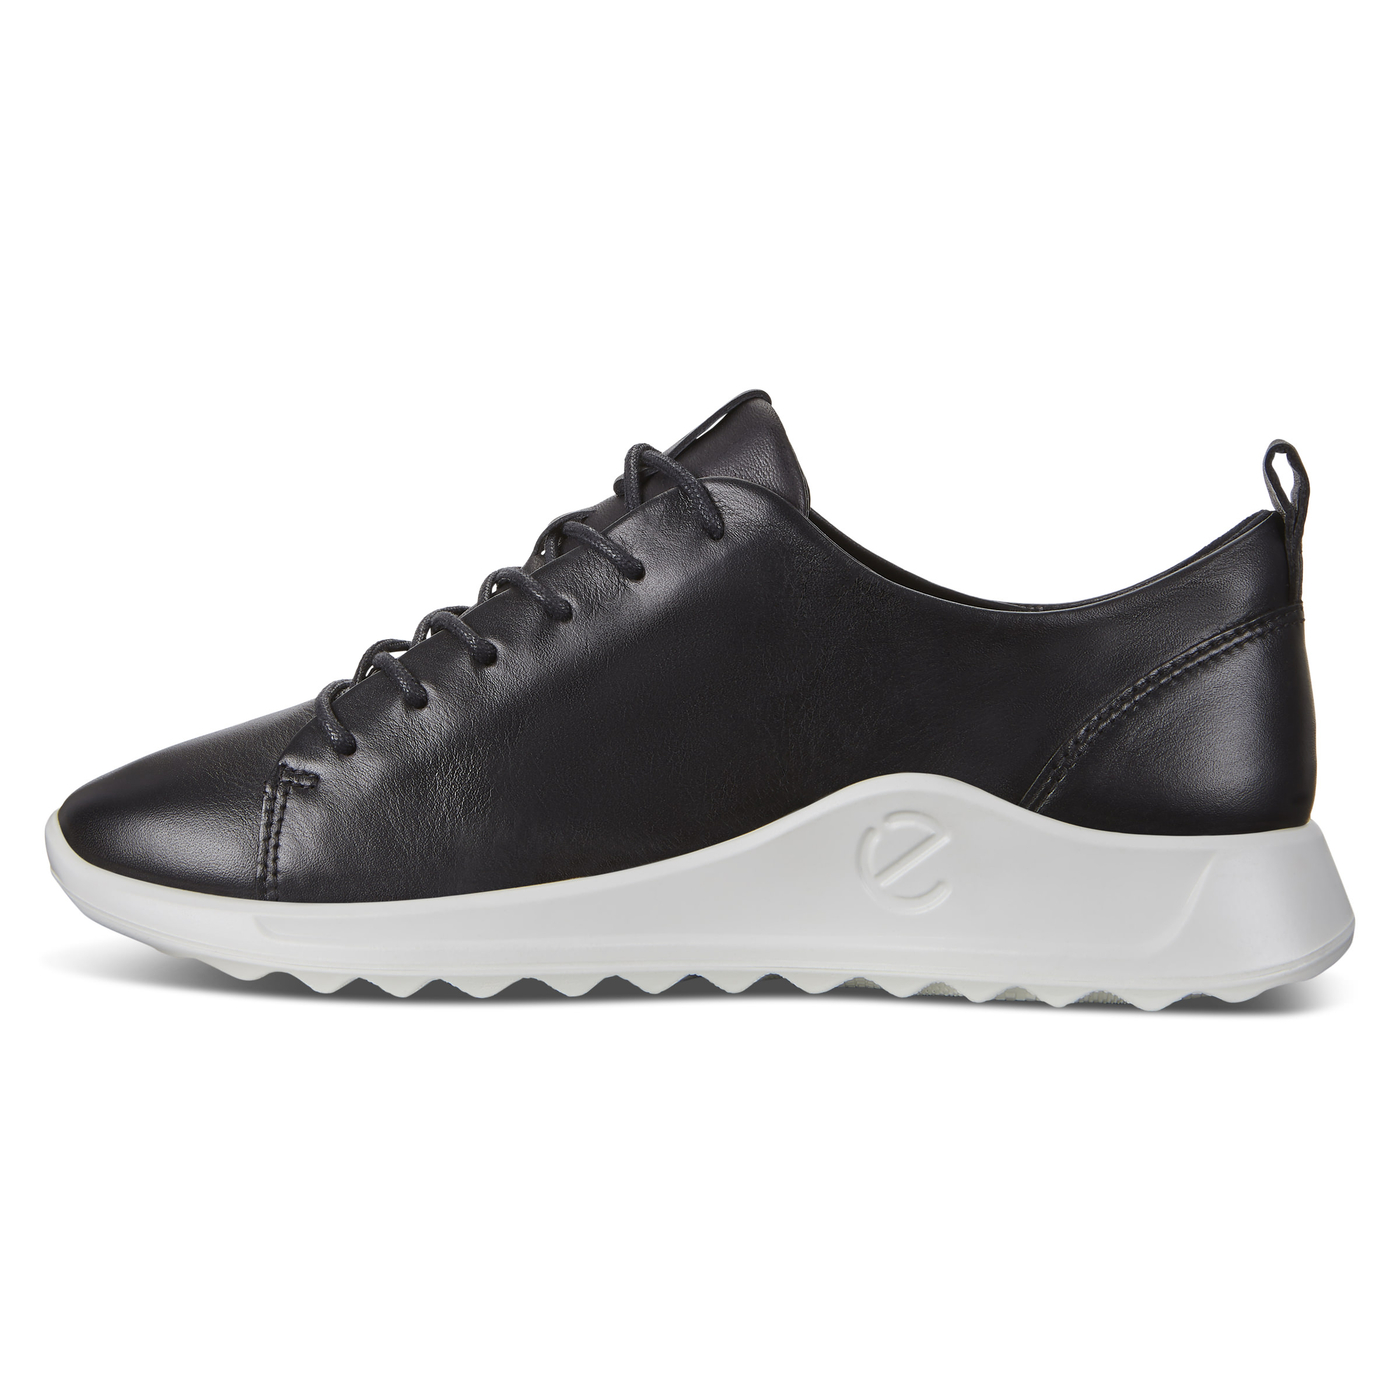 ECCO FLEXURE RUNNER W Shoe